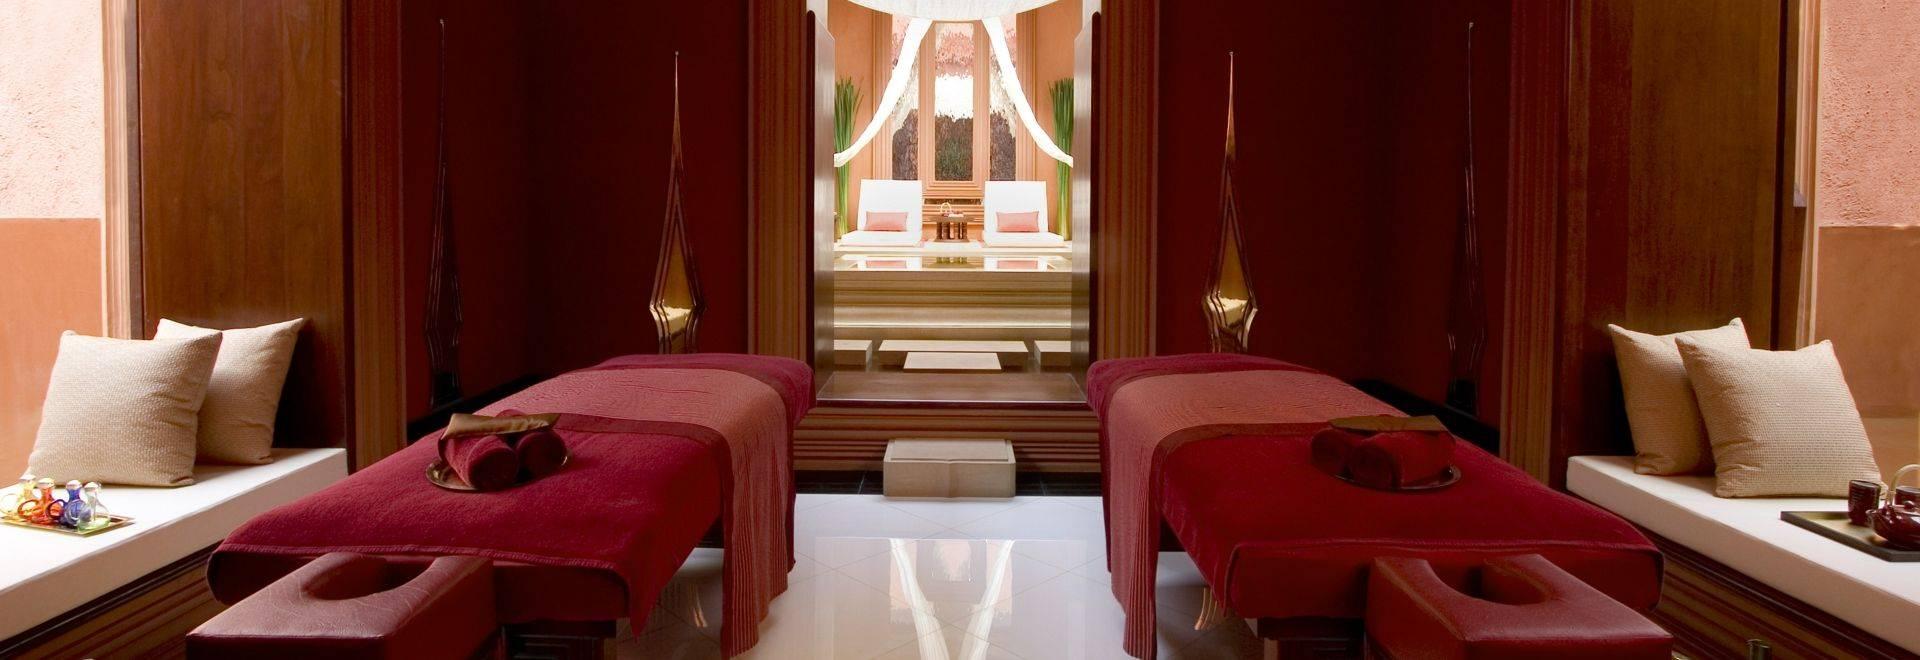 Barai-Spa-treatment-room.jpg